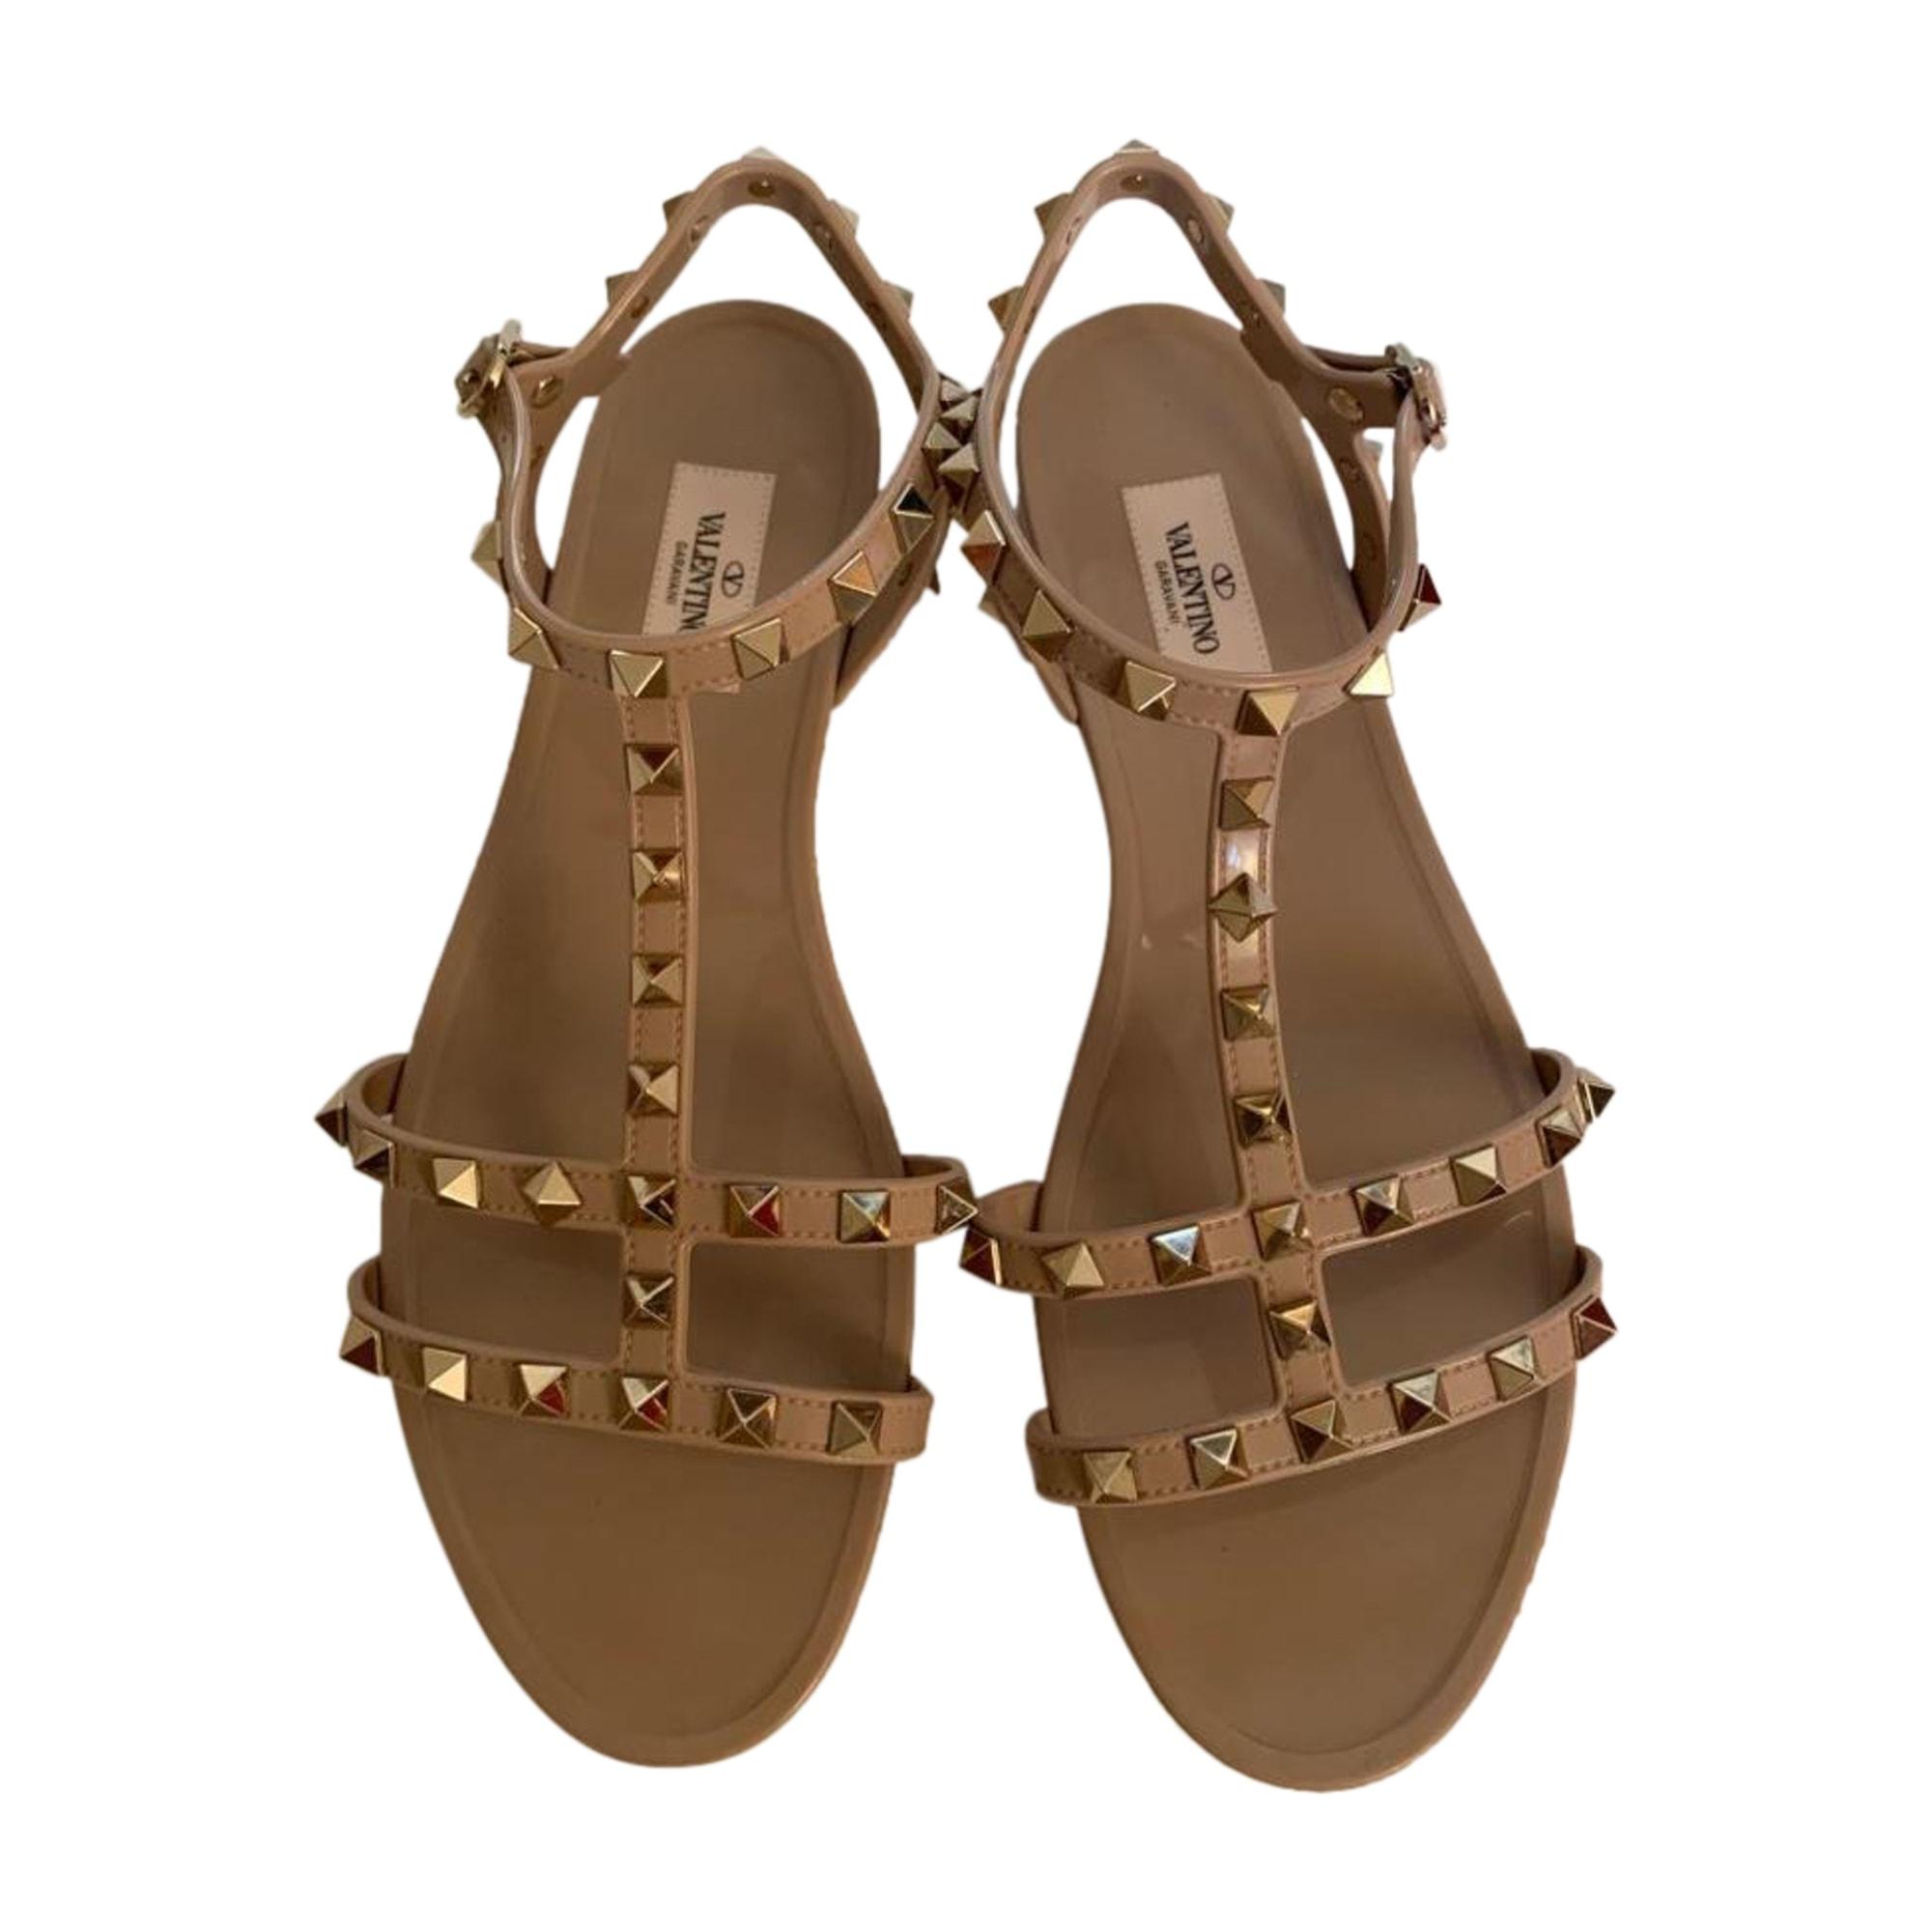 Sandales plates  VALENTINO Rockstud Beige, camel